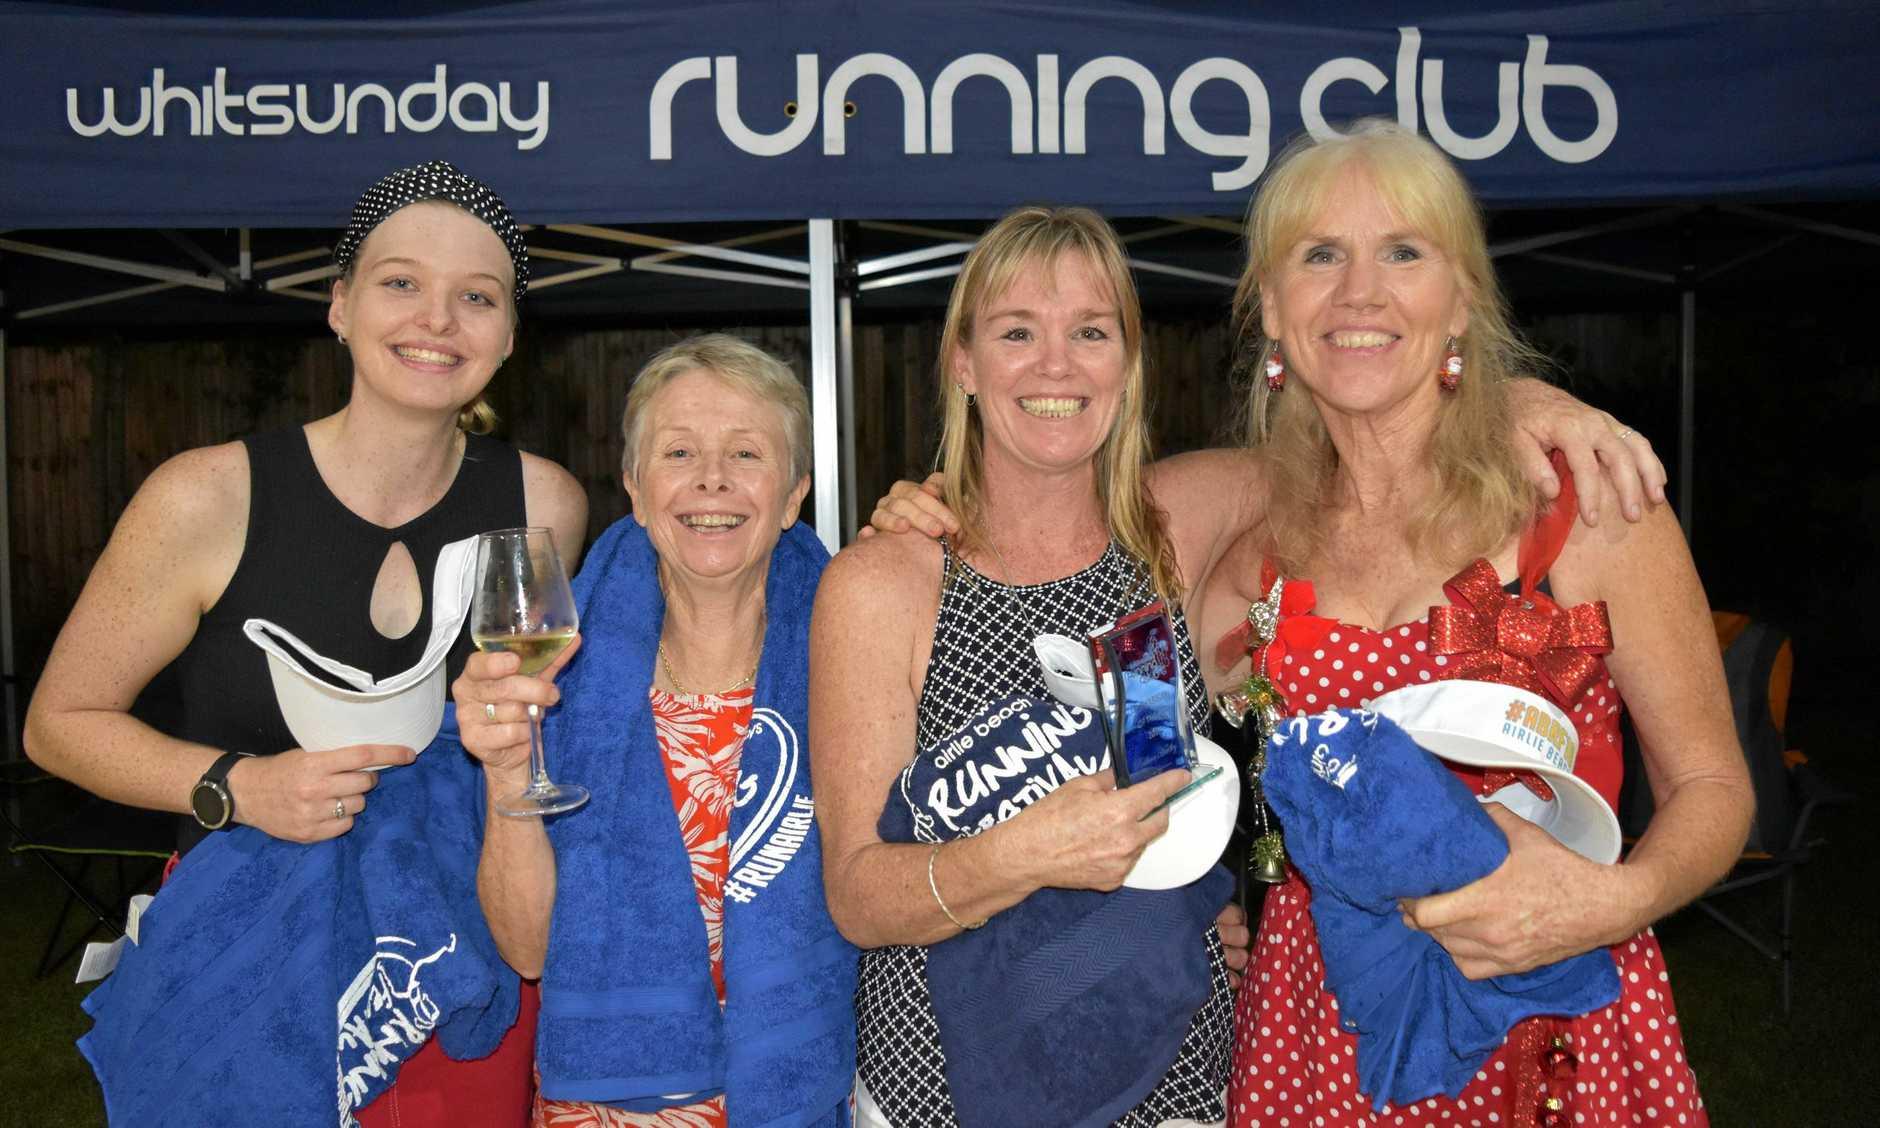 Whitsunday Running Club female award recipients Ayla Hadley, Sylvie Martin, Rebecca Hadley and Maryanne Fyvie.